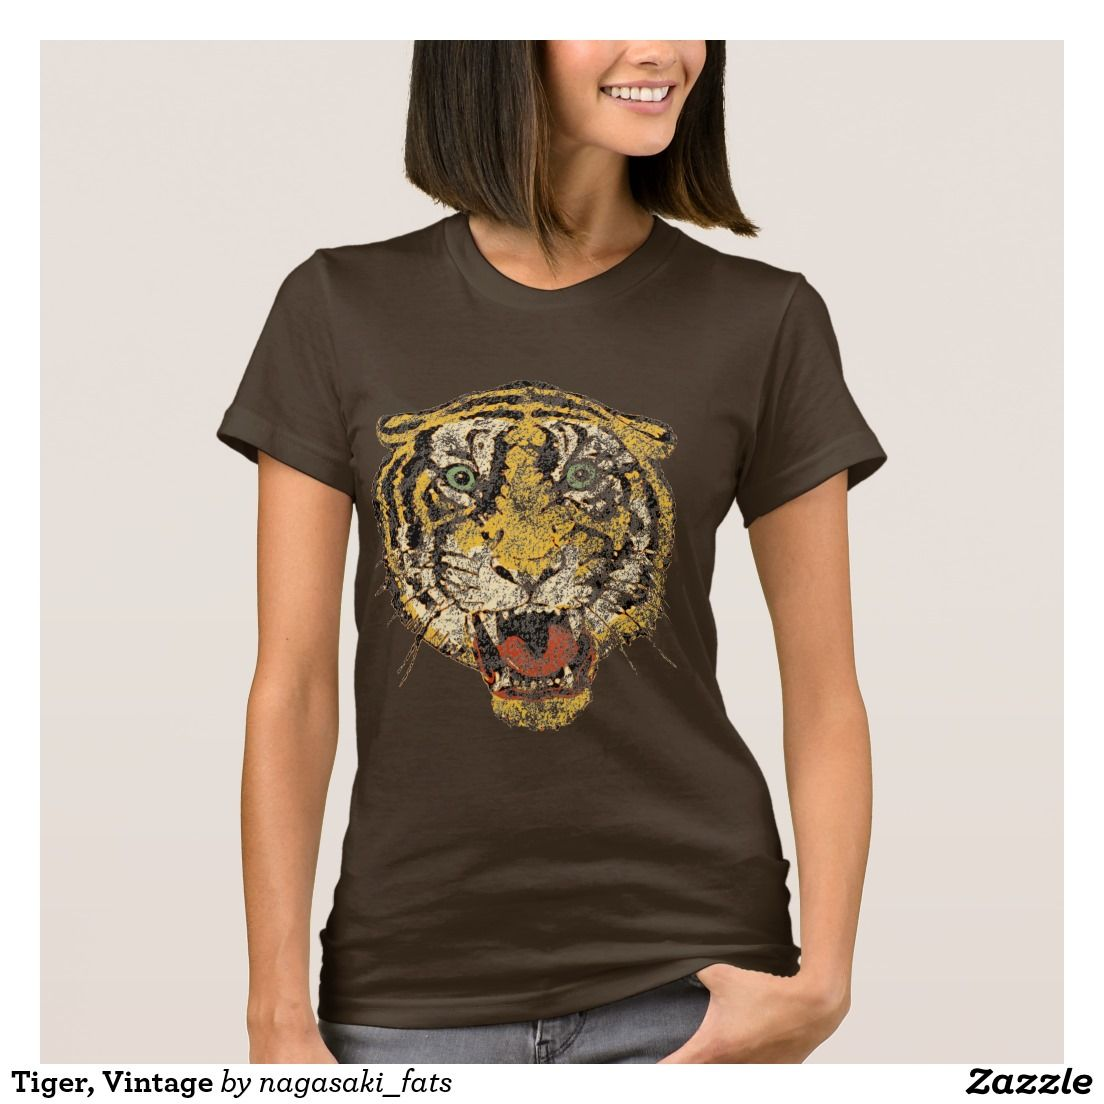 Design t shirt zazzle - Design T Shirt Zazzle 10